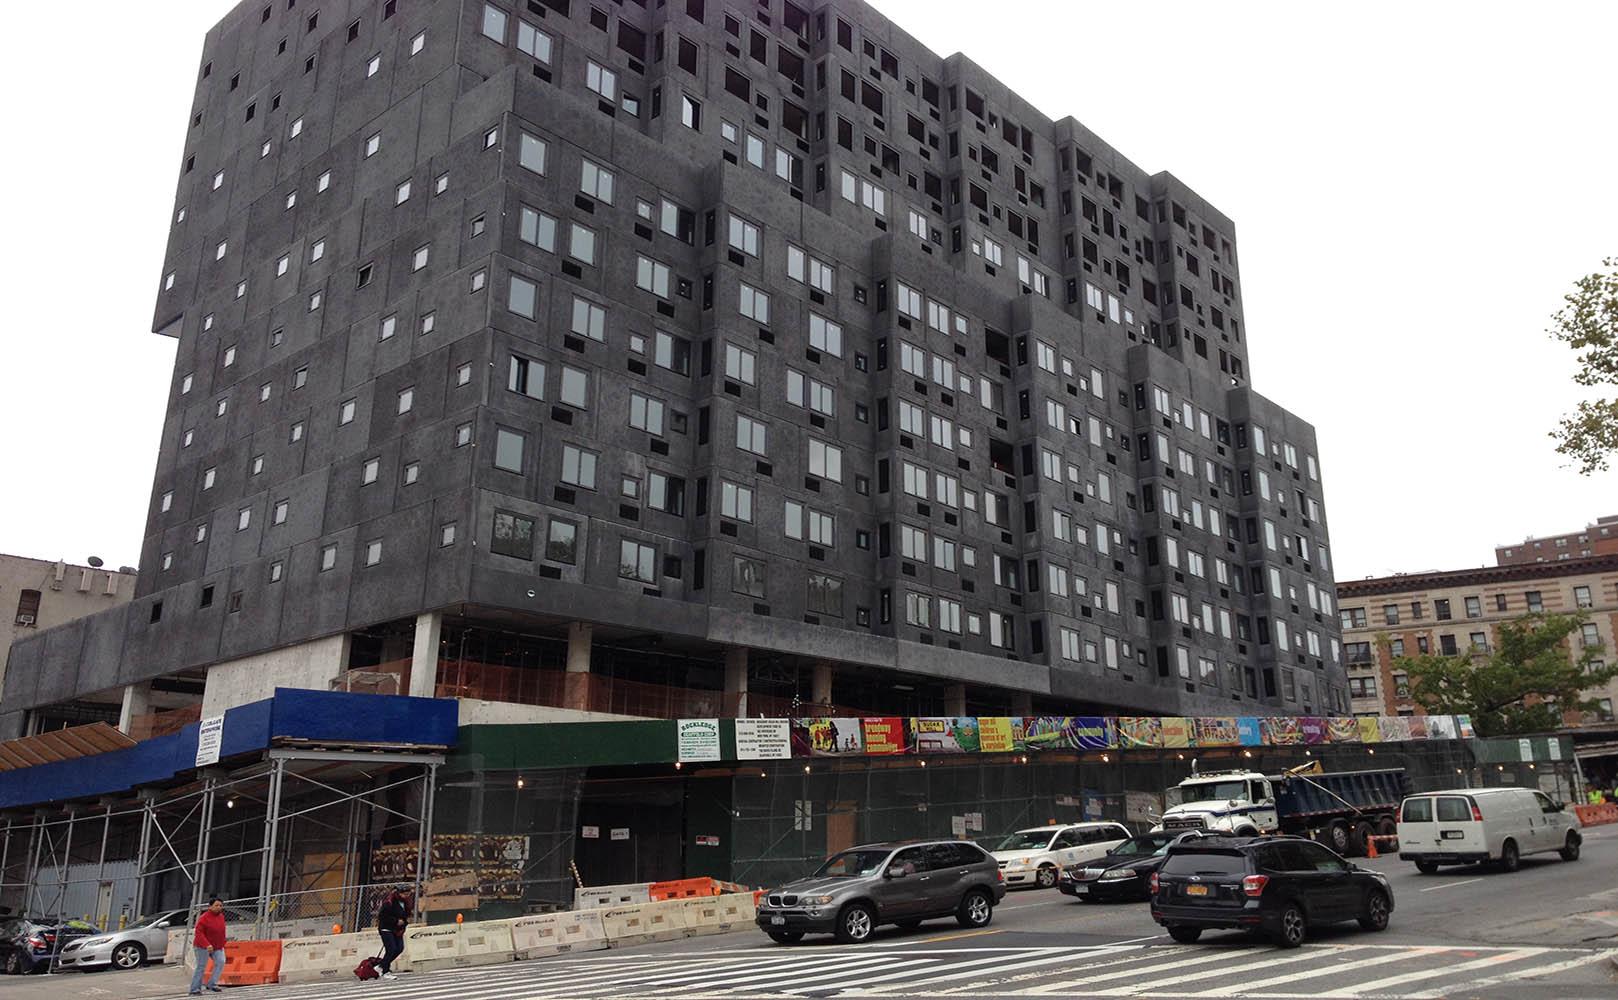 Upper Manhattan Legionnaires community meeting Tuesday